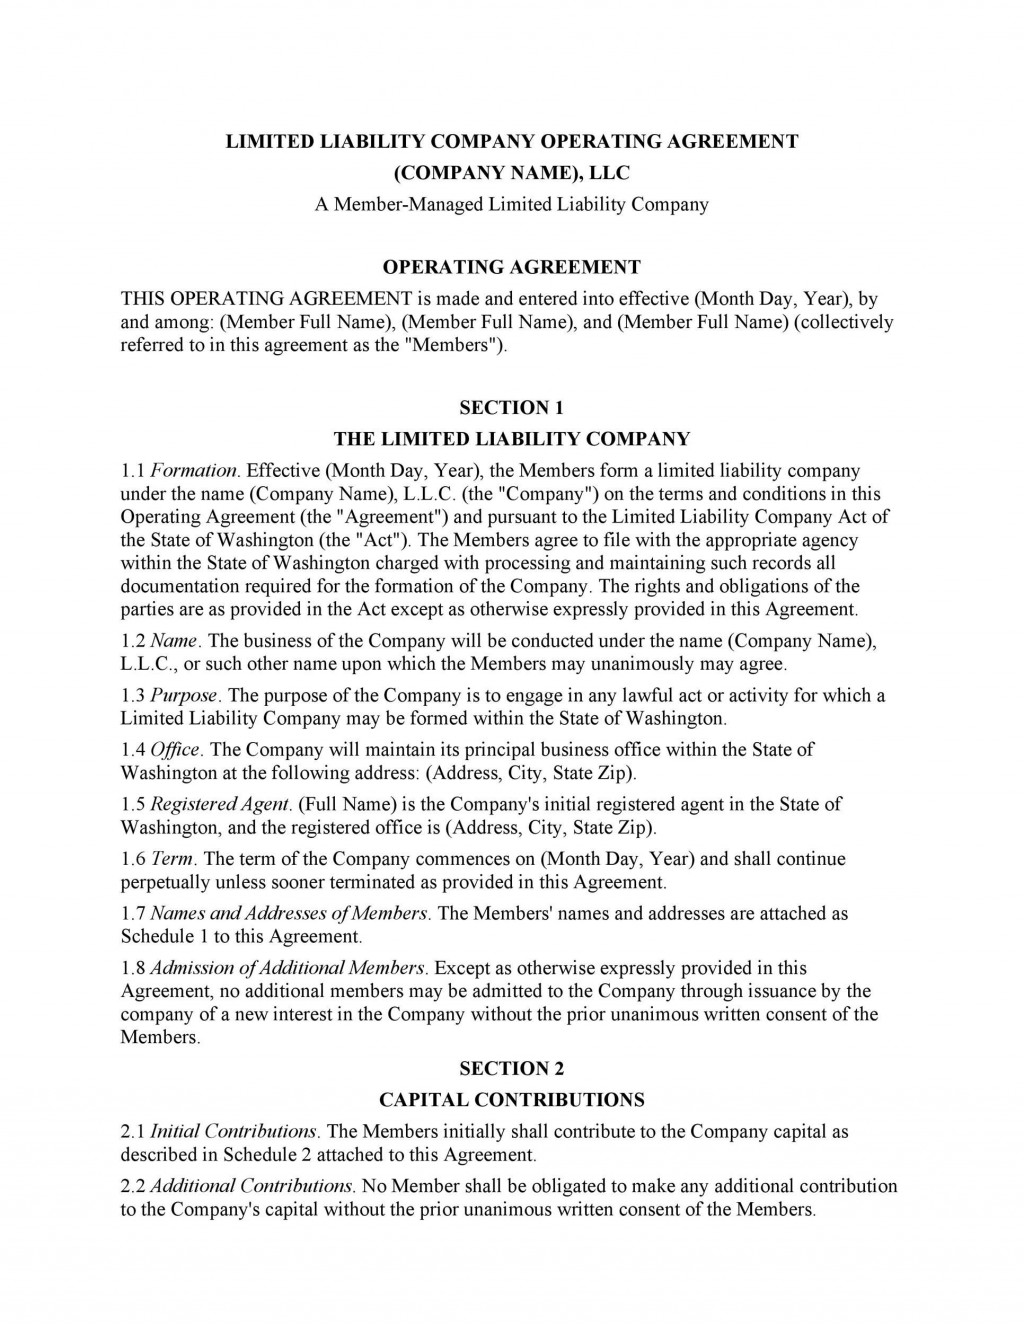 007 Singular Operating Agreement Template For Llc High Resolution  Form Florida TexaLarge